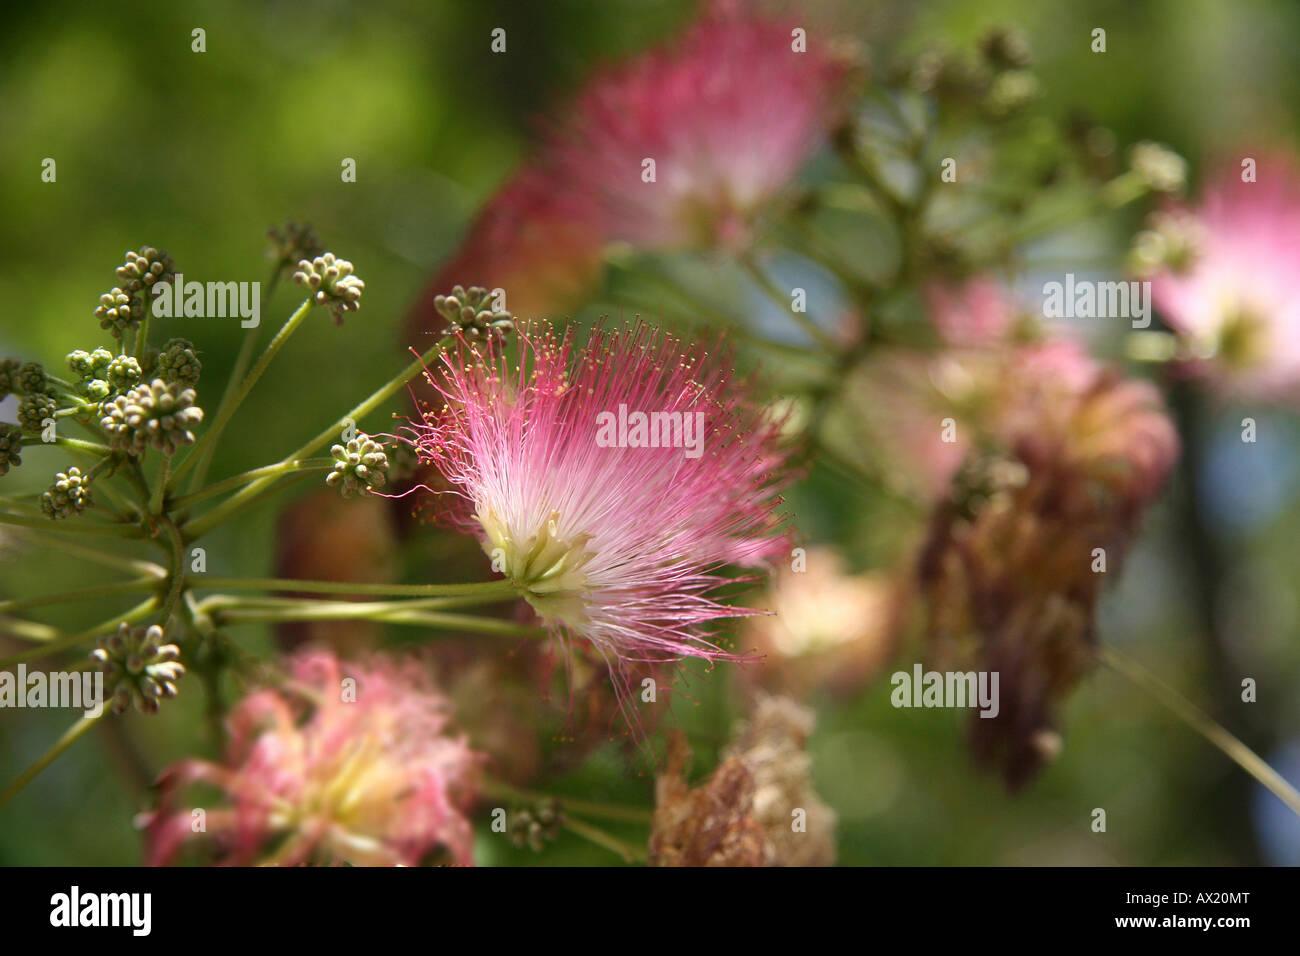 Persian silk tree or pink siris albizia julibrissin crete greece persian silk tree or pink siris albizia julibrissin crete greece europe mightylinksfo